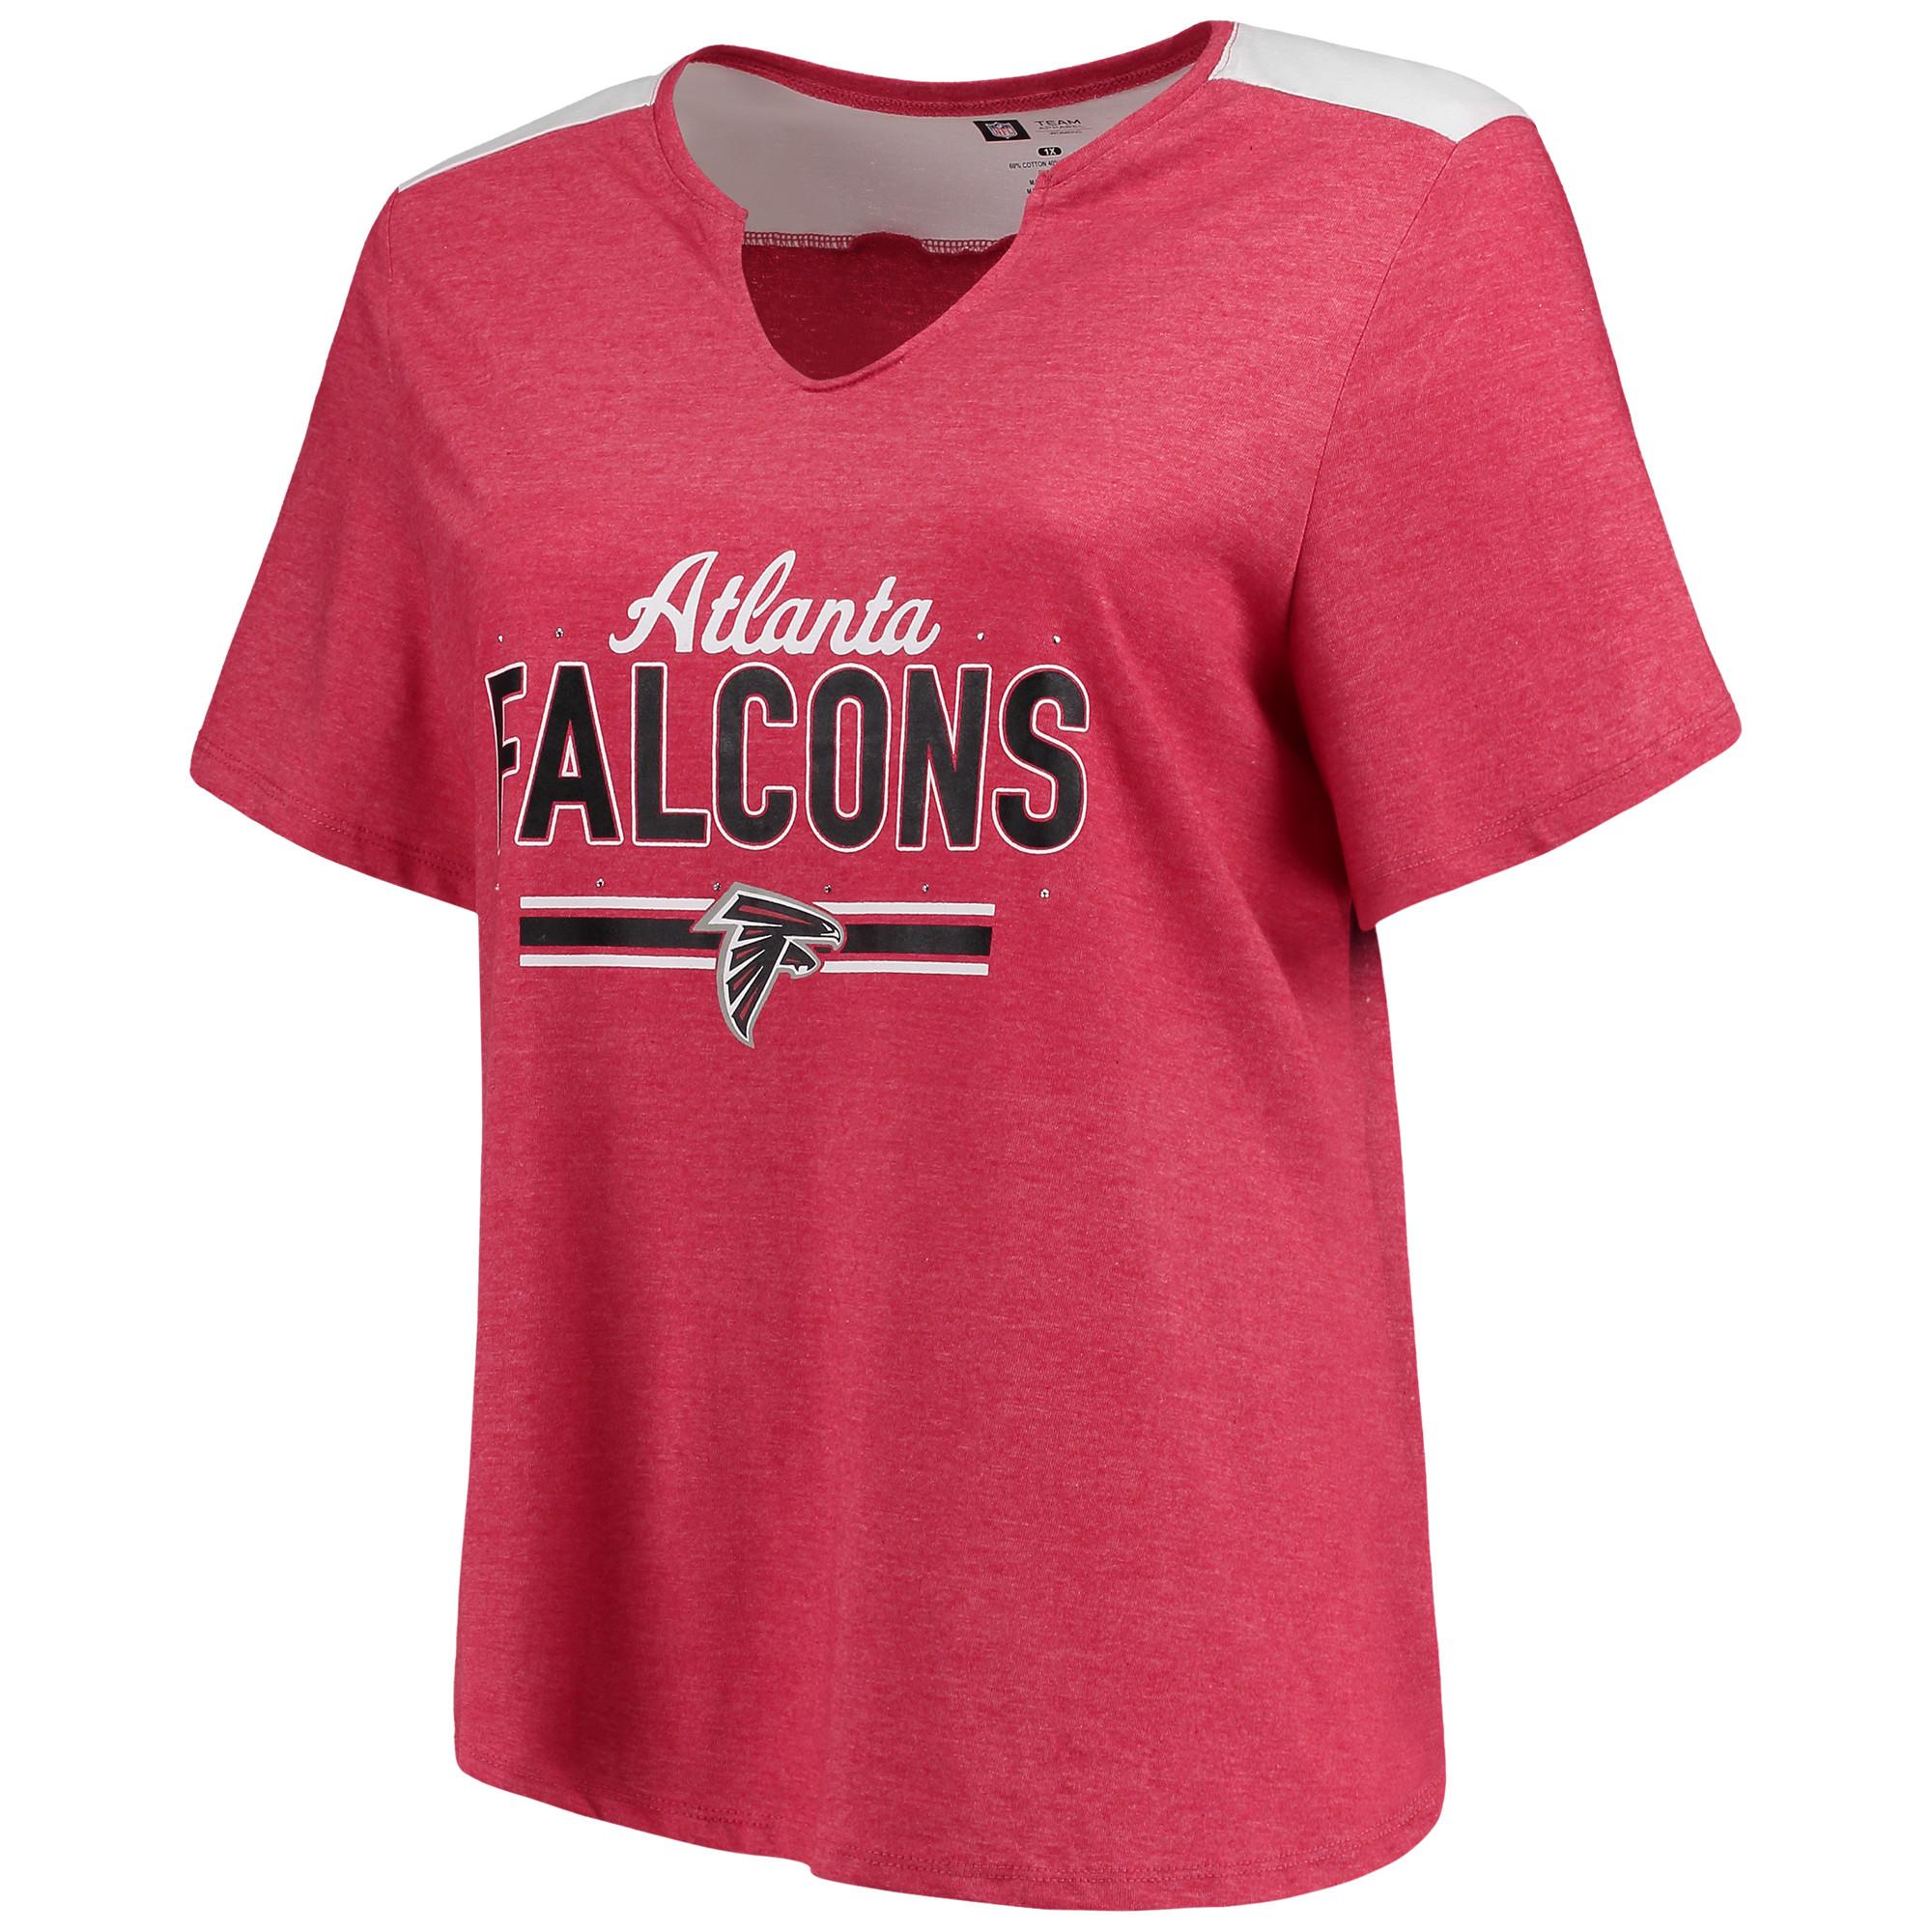 Women's Majestic Heathered Red Atlanta Falcons Notch Neck Plus Size T-Shirt